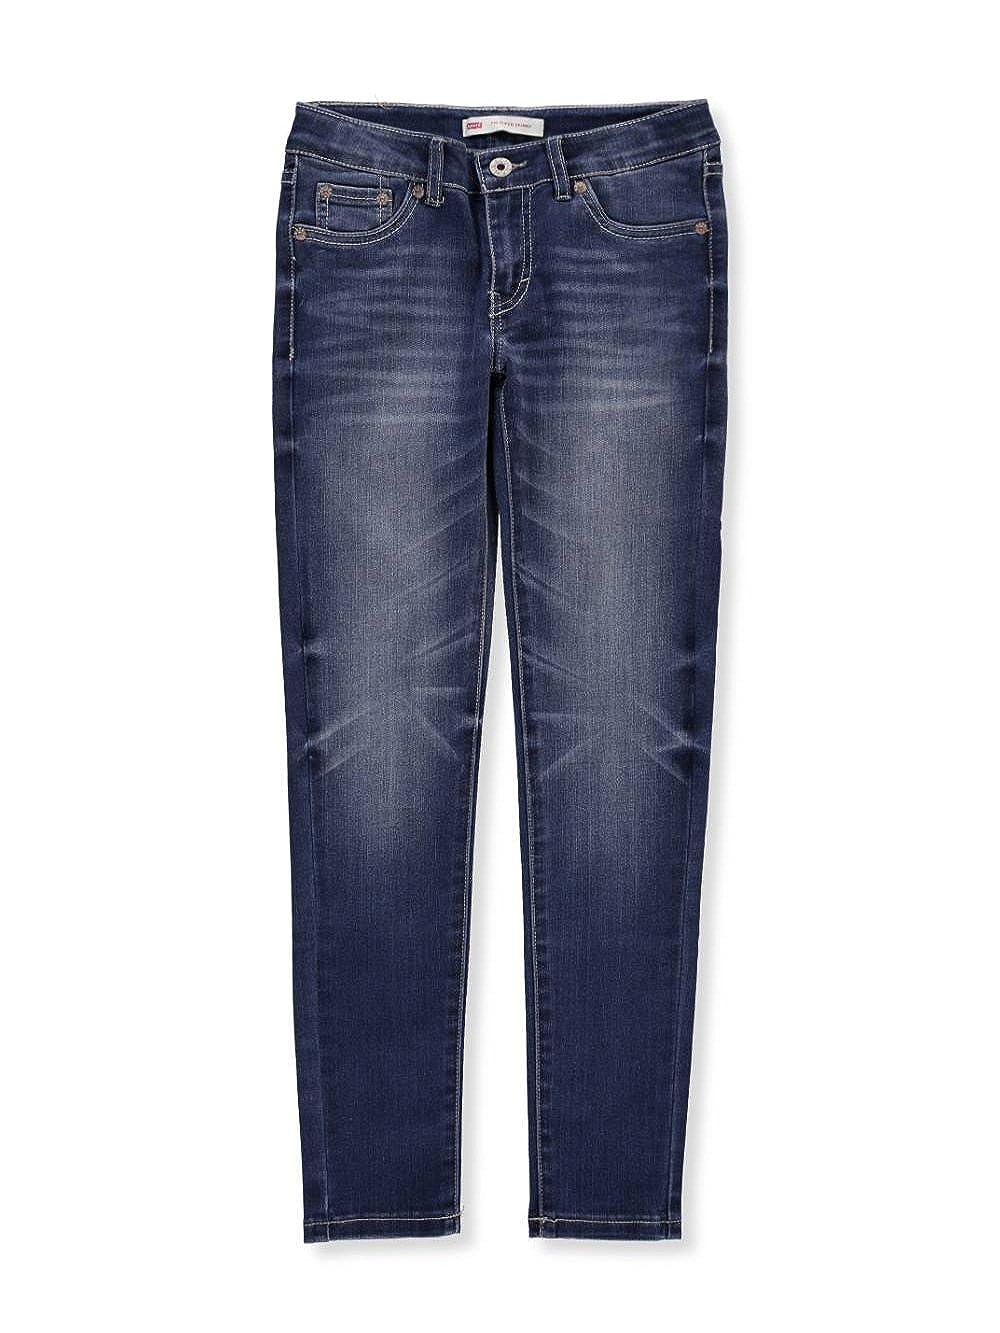 188fad24897d Amazon.com  Levi s¿ Kids Girl s 710¿ Super Skinny Jean (Big Kids) Indigo  Shelter 10  Clothing